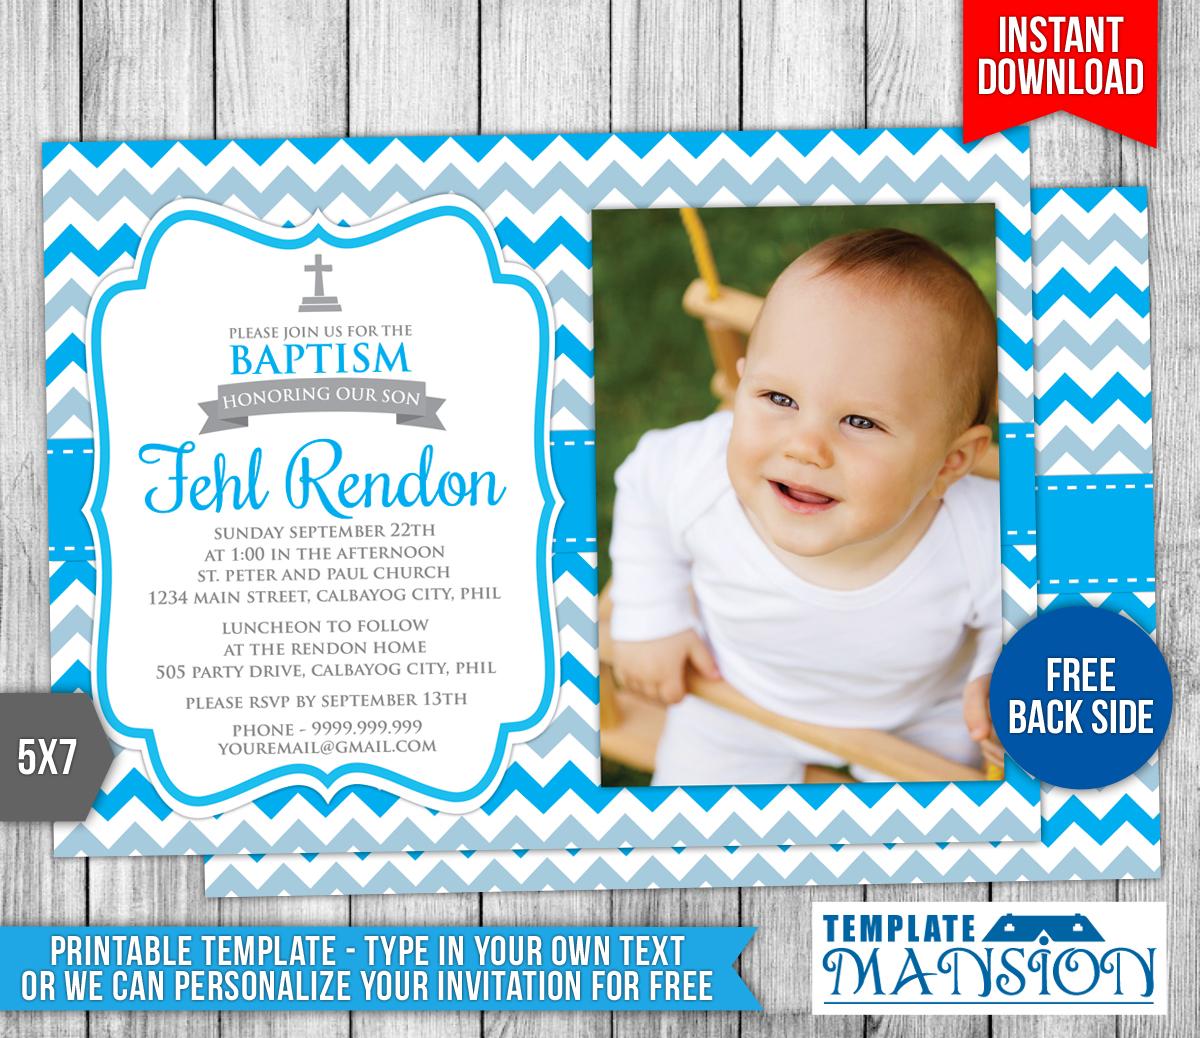 Baptismal Invitation Message was amazing invitation layout